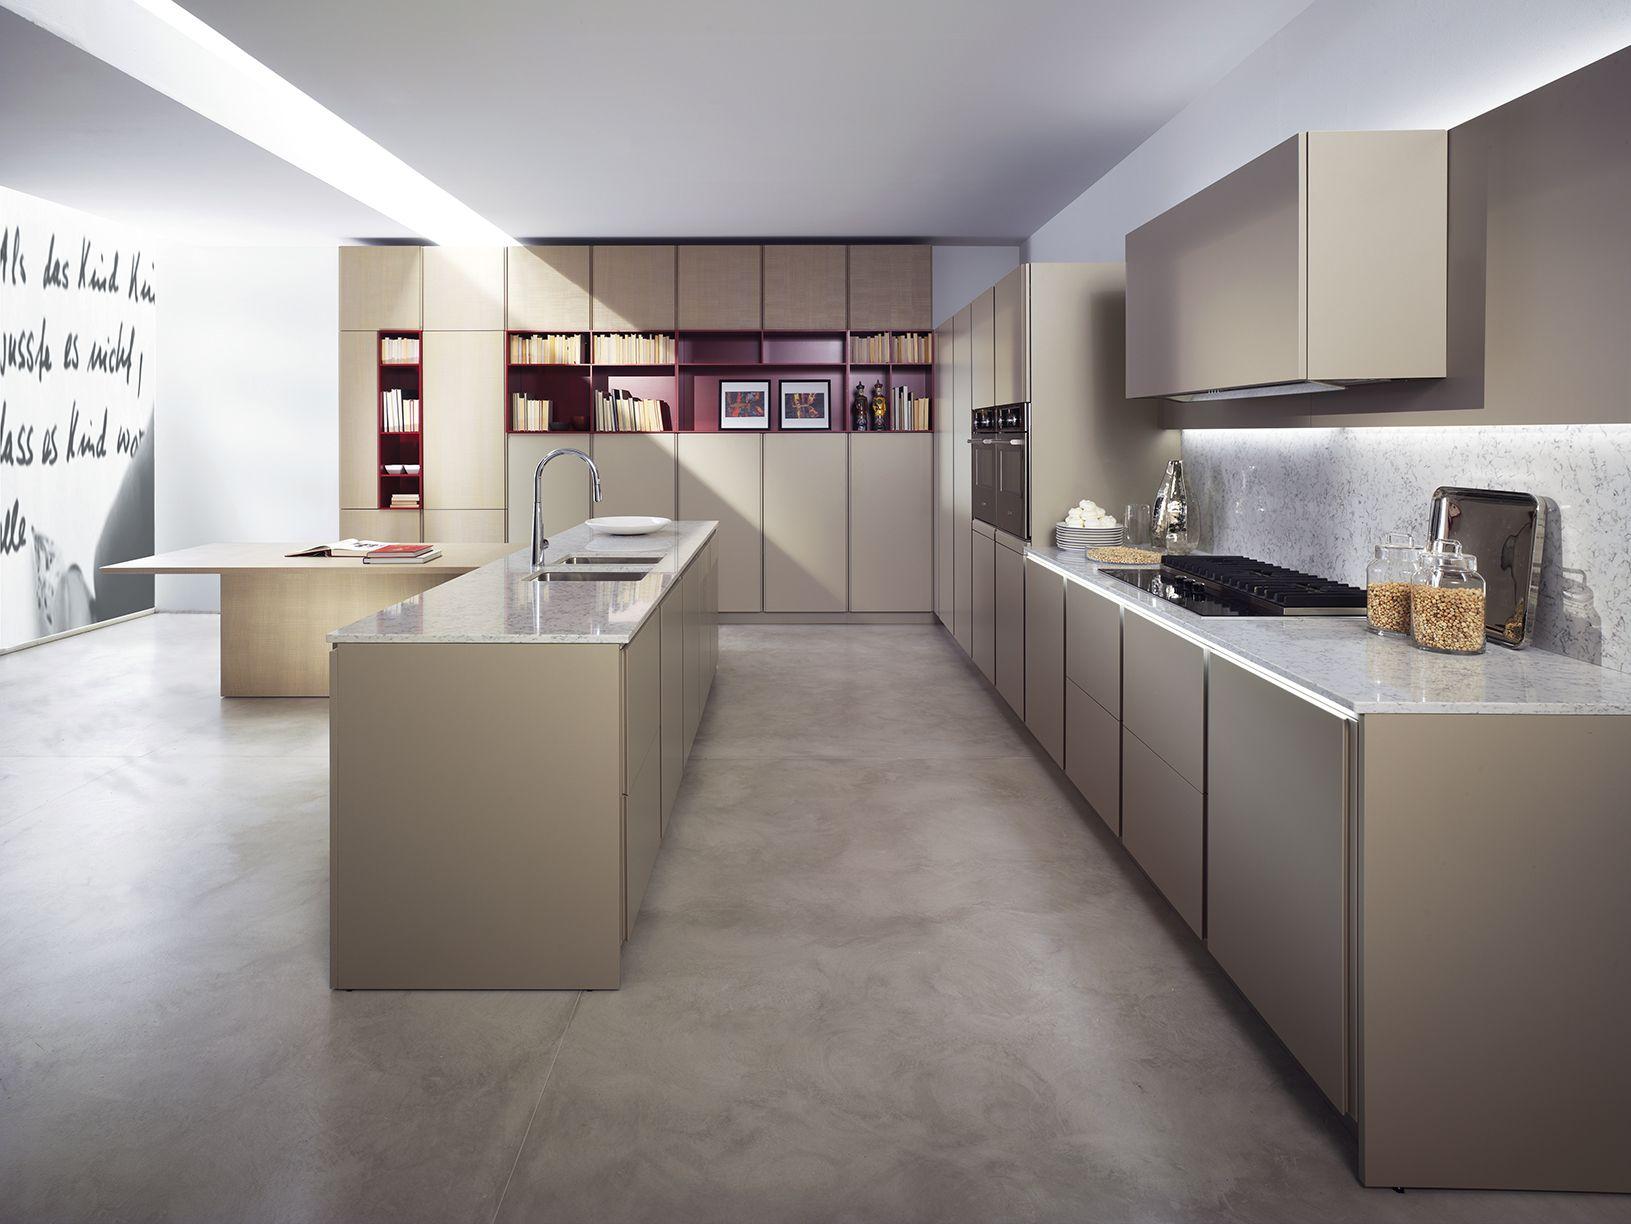 Cucine componibili italiane Biefbi modello CapriBiefbi Cucine ...